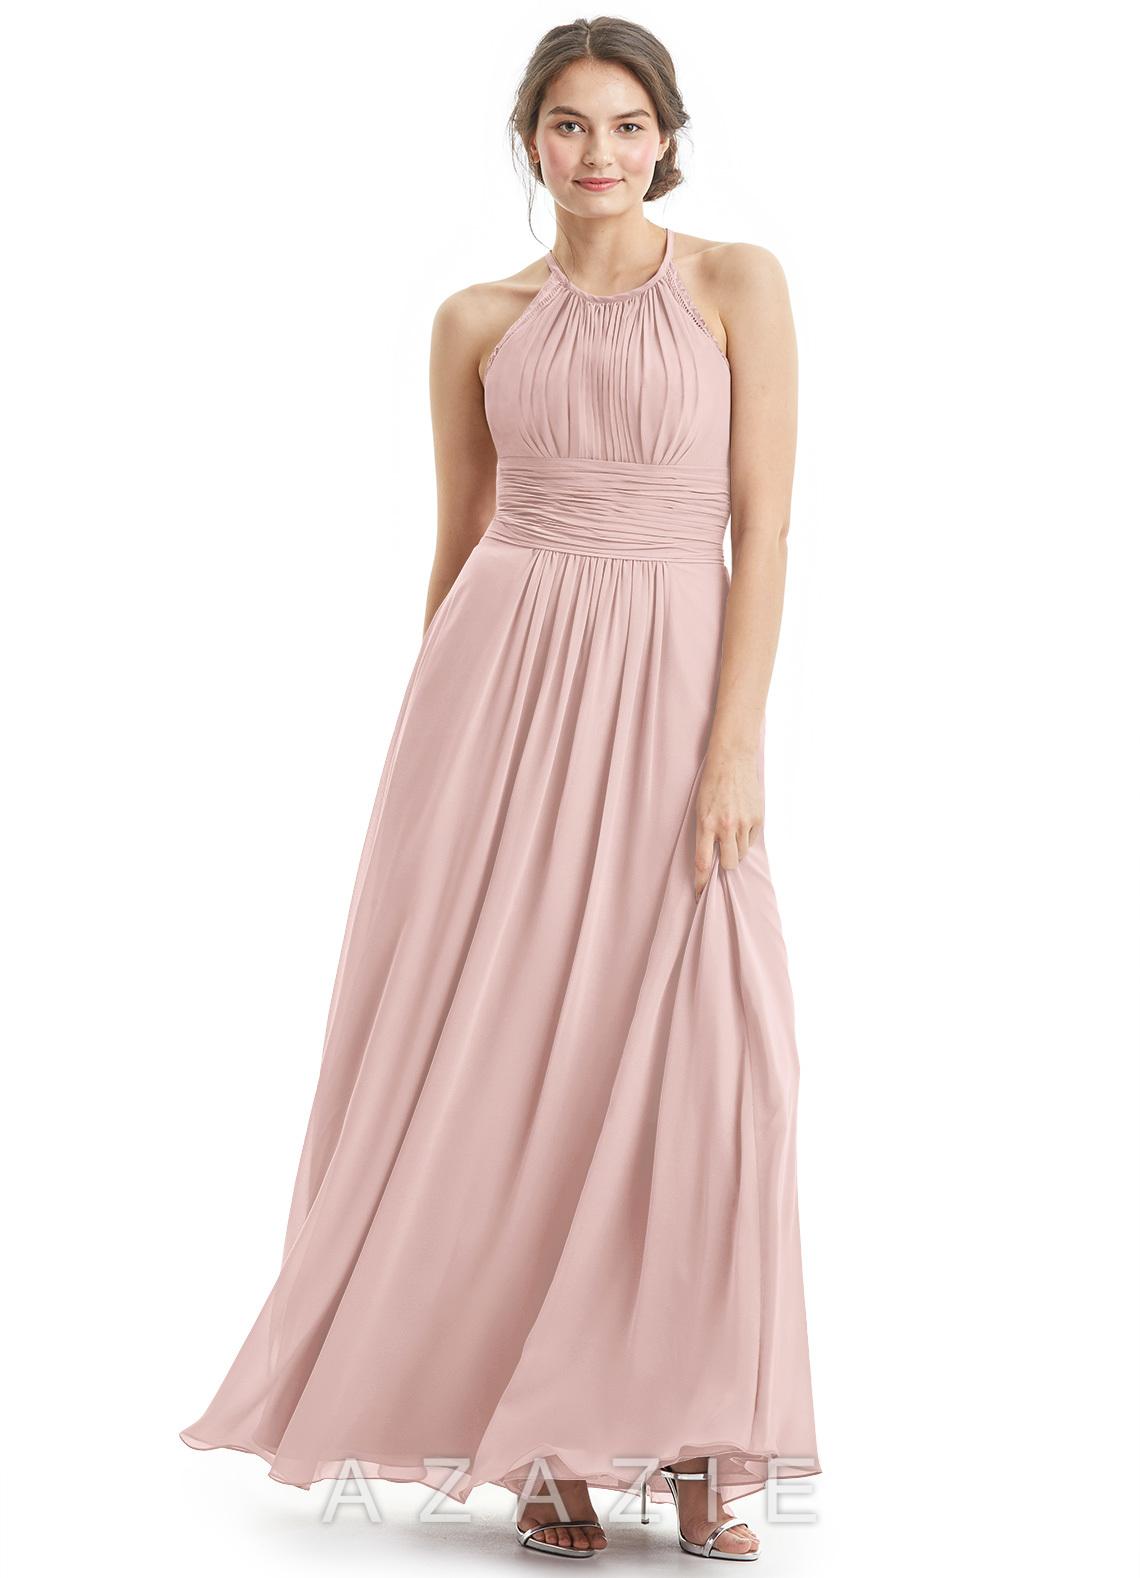 Azazie regina bridesmaid dress azazie color dusty rose ombrellifo Gallery